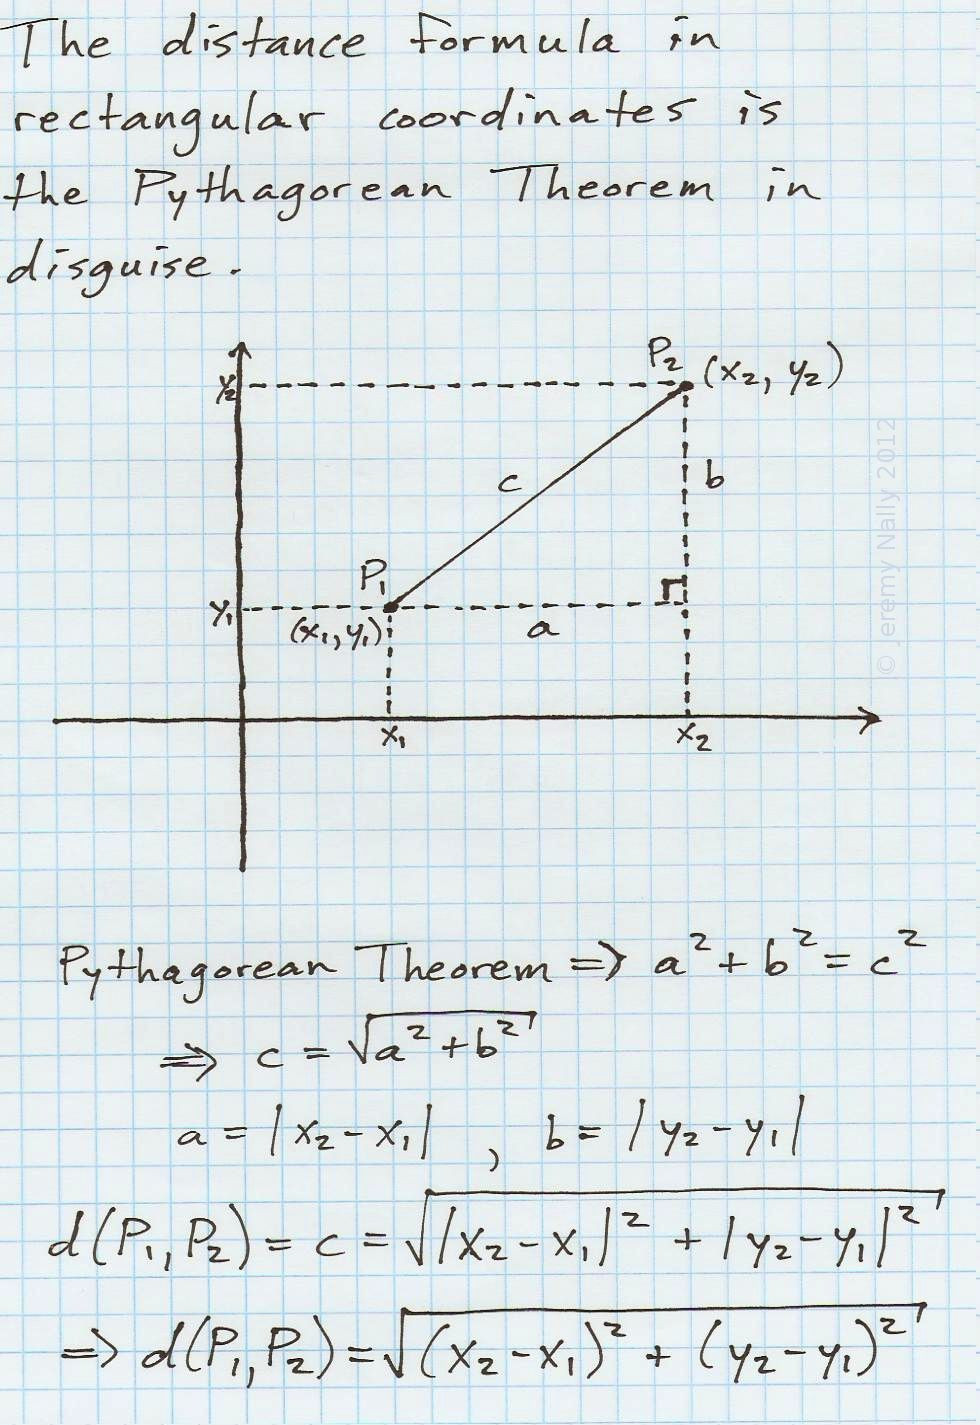 Distance and Midpoint formula Worksheet the Distance formula In Rectangular Cartesian Coordinates